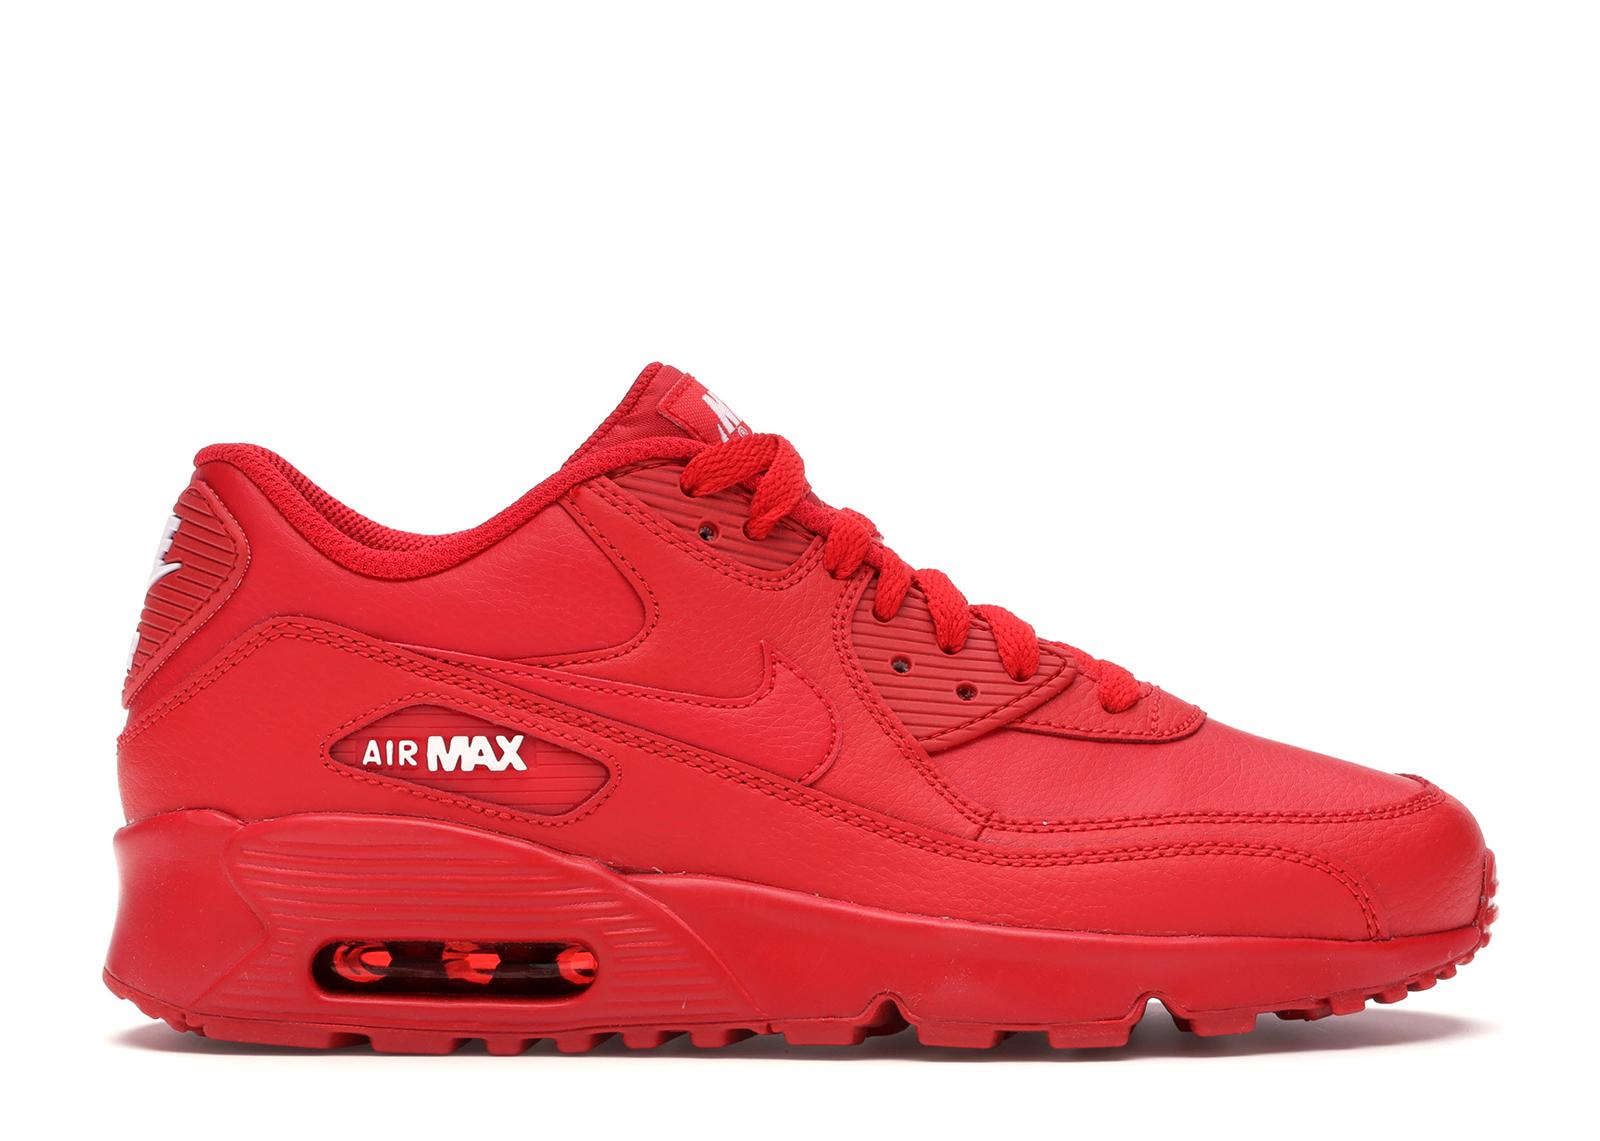 Nike Air Max 90 LTR Red (GS) - 833412-603